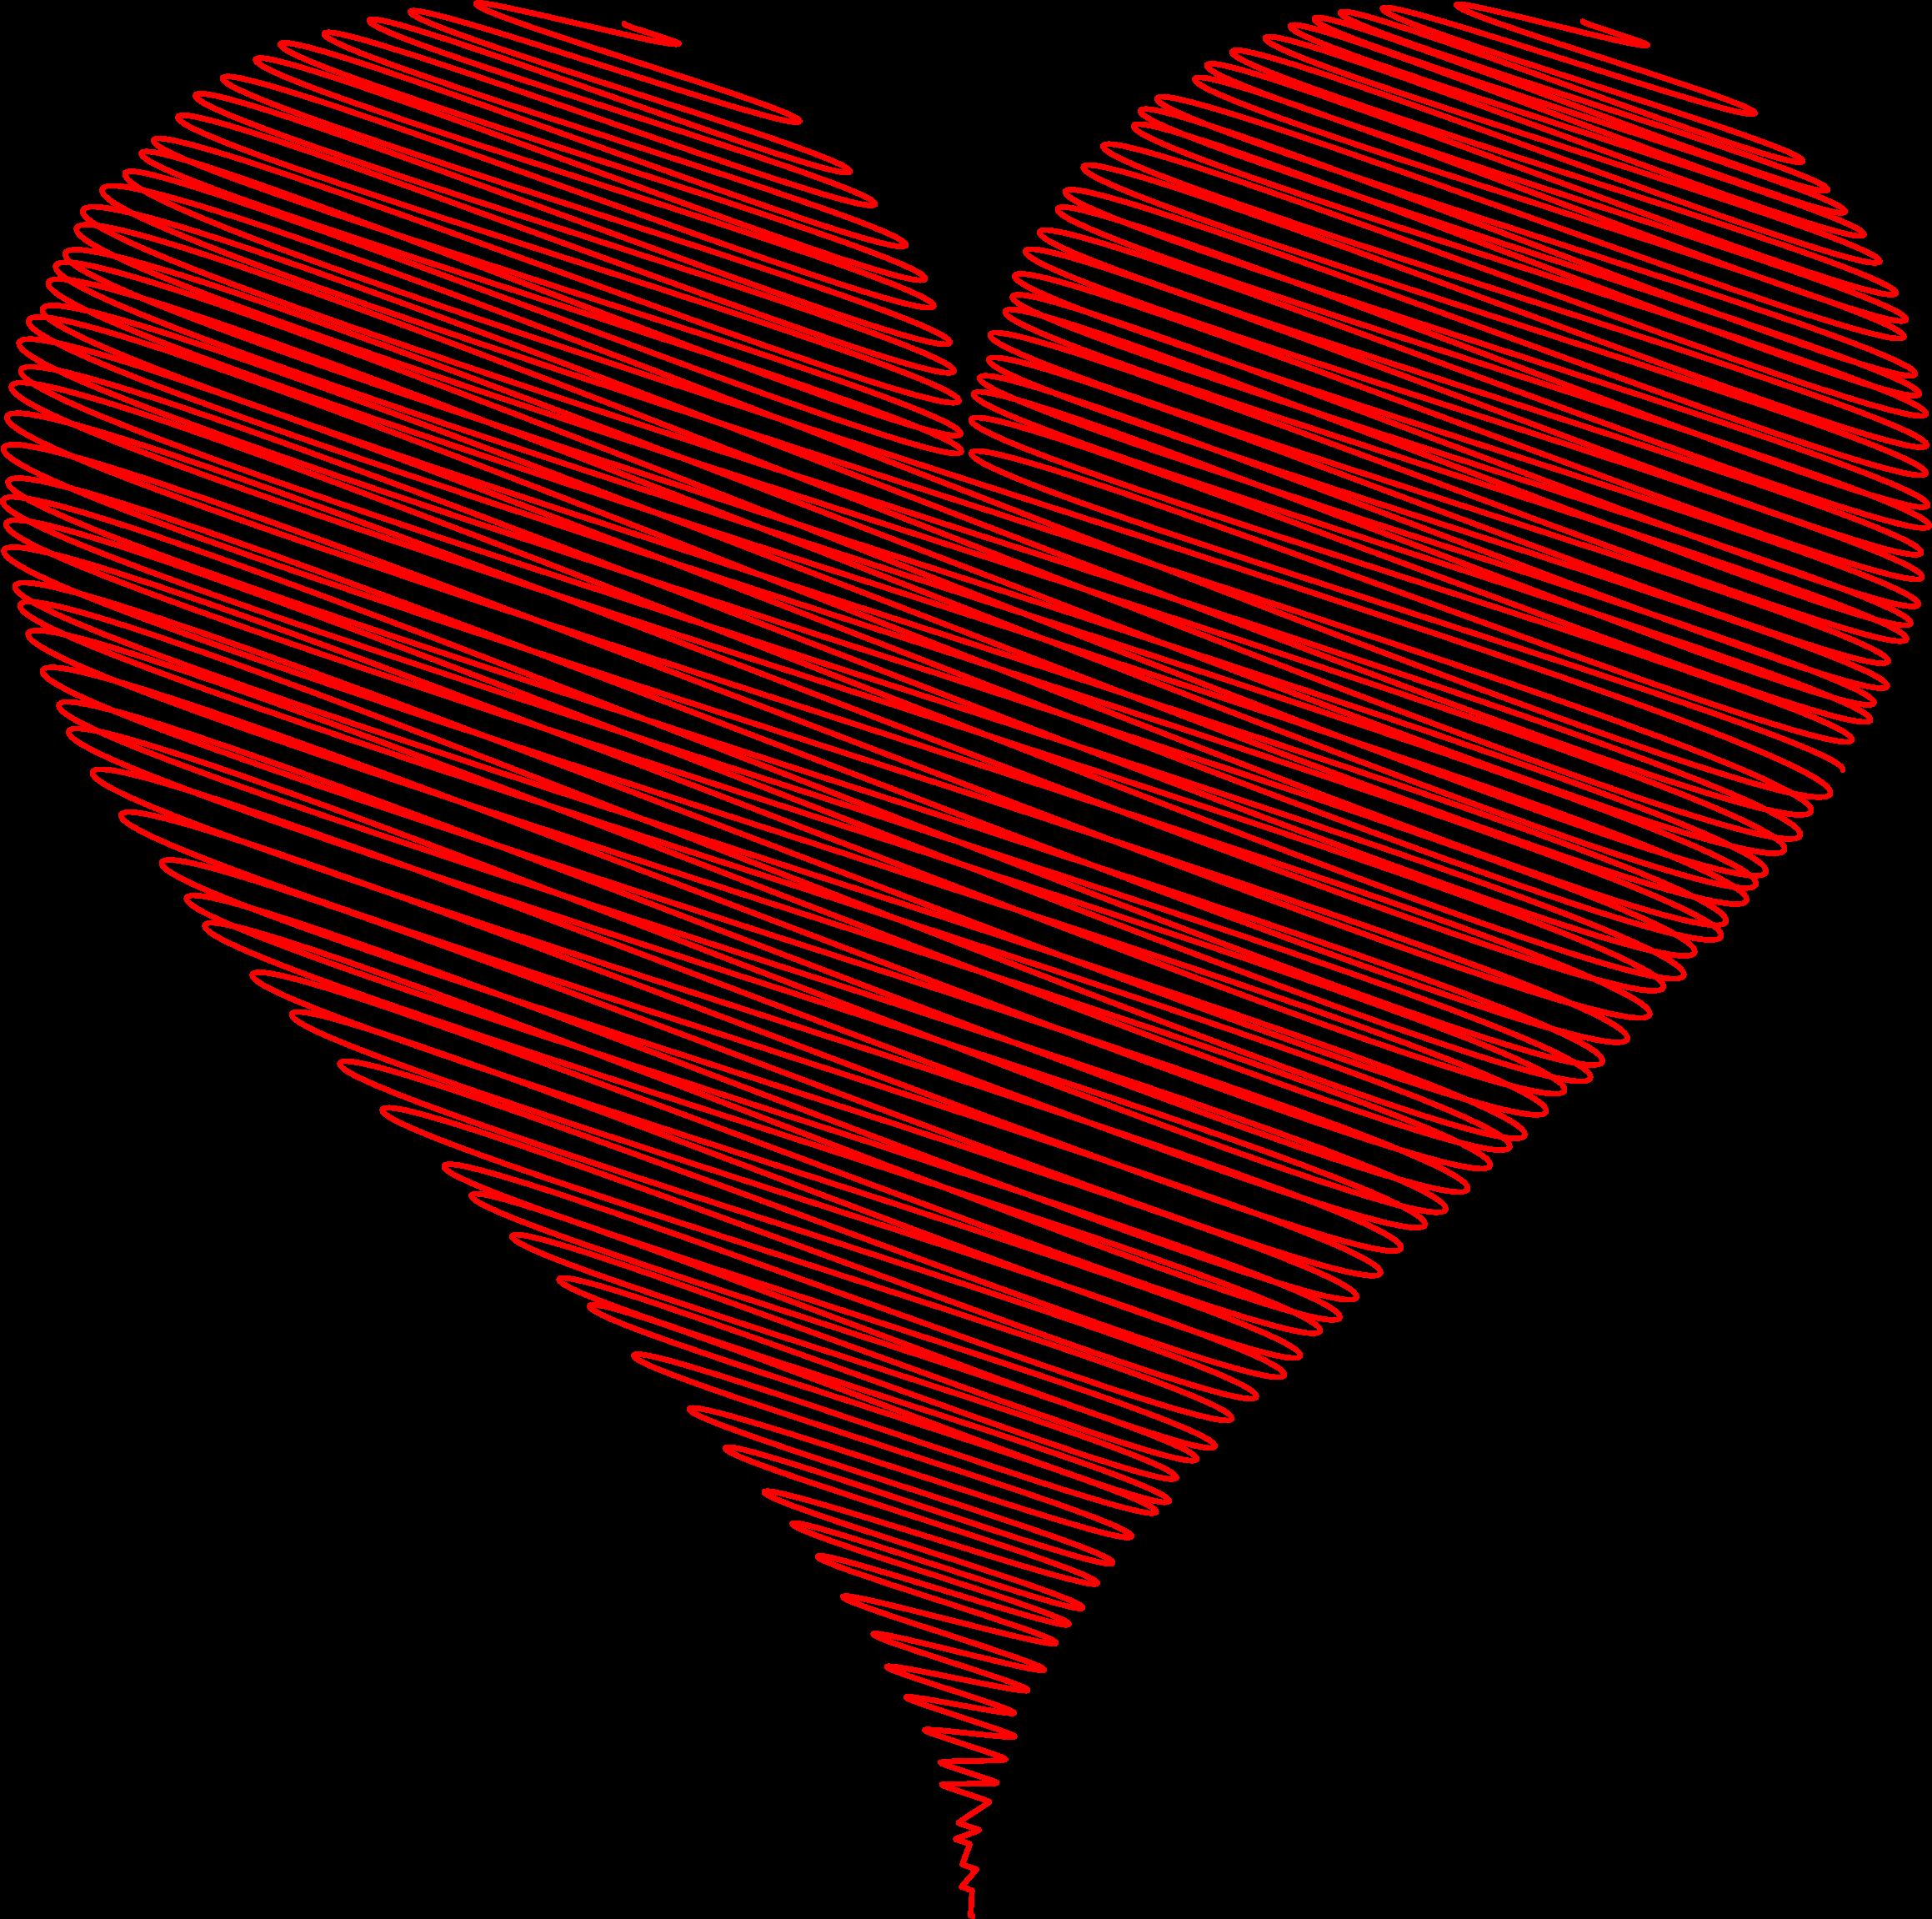 Polka dot heart clipart jpg free Clipart - Scribbled Heart jpg free